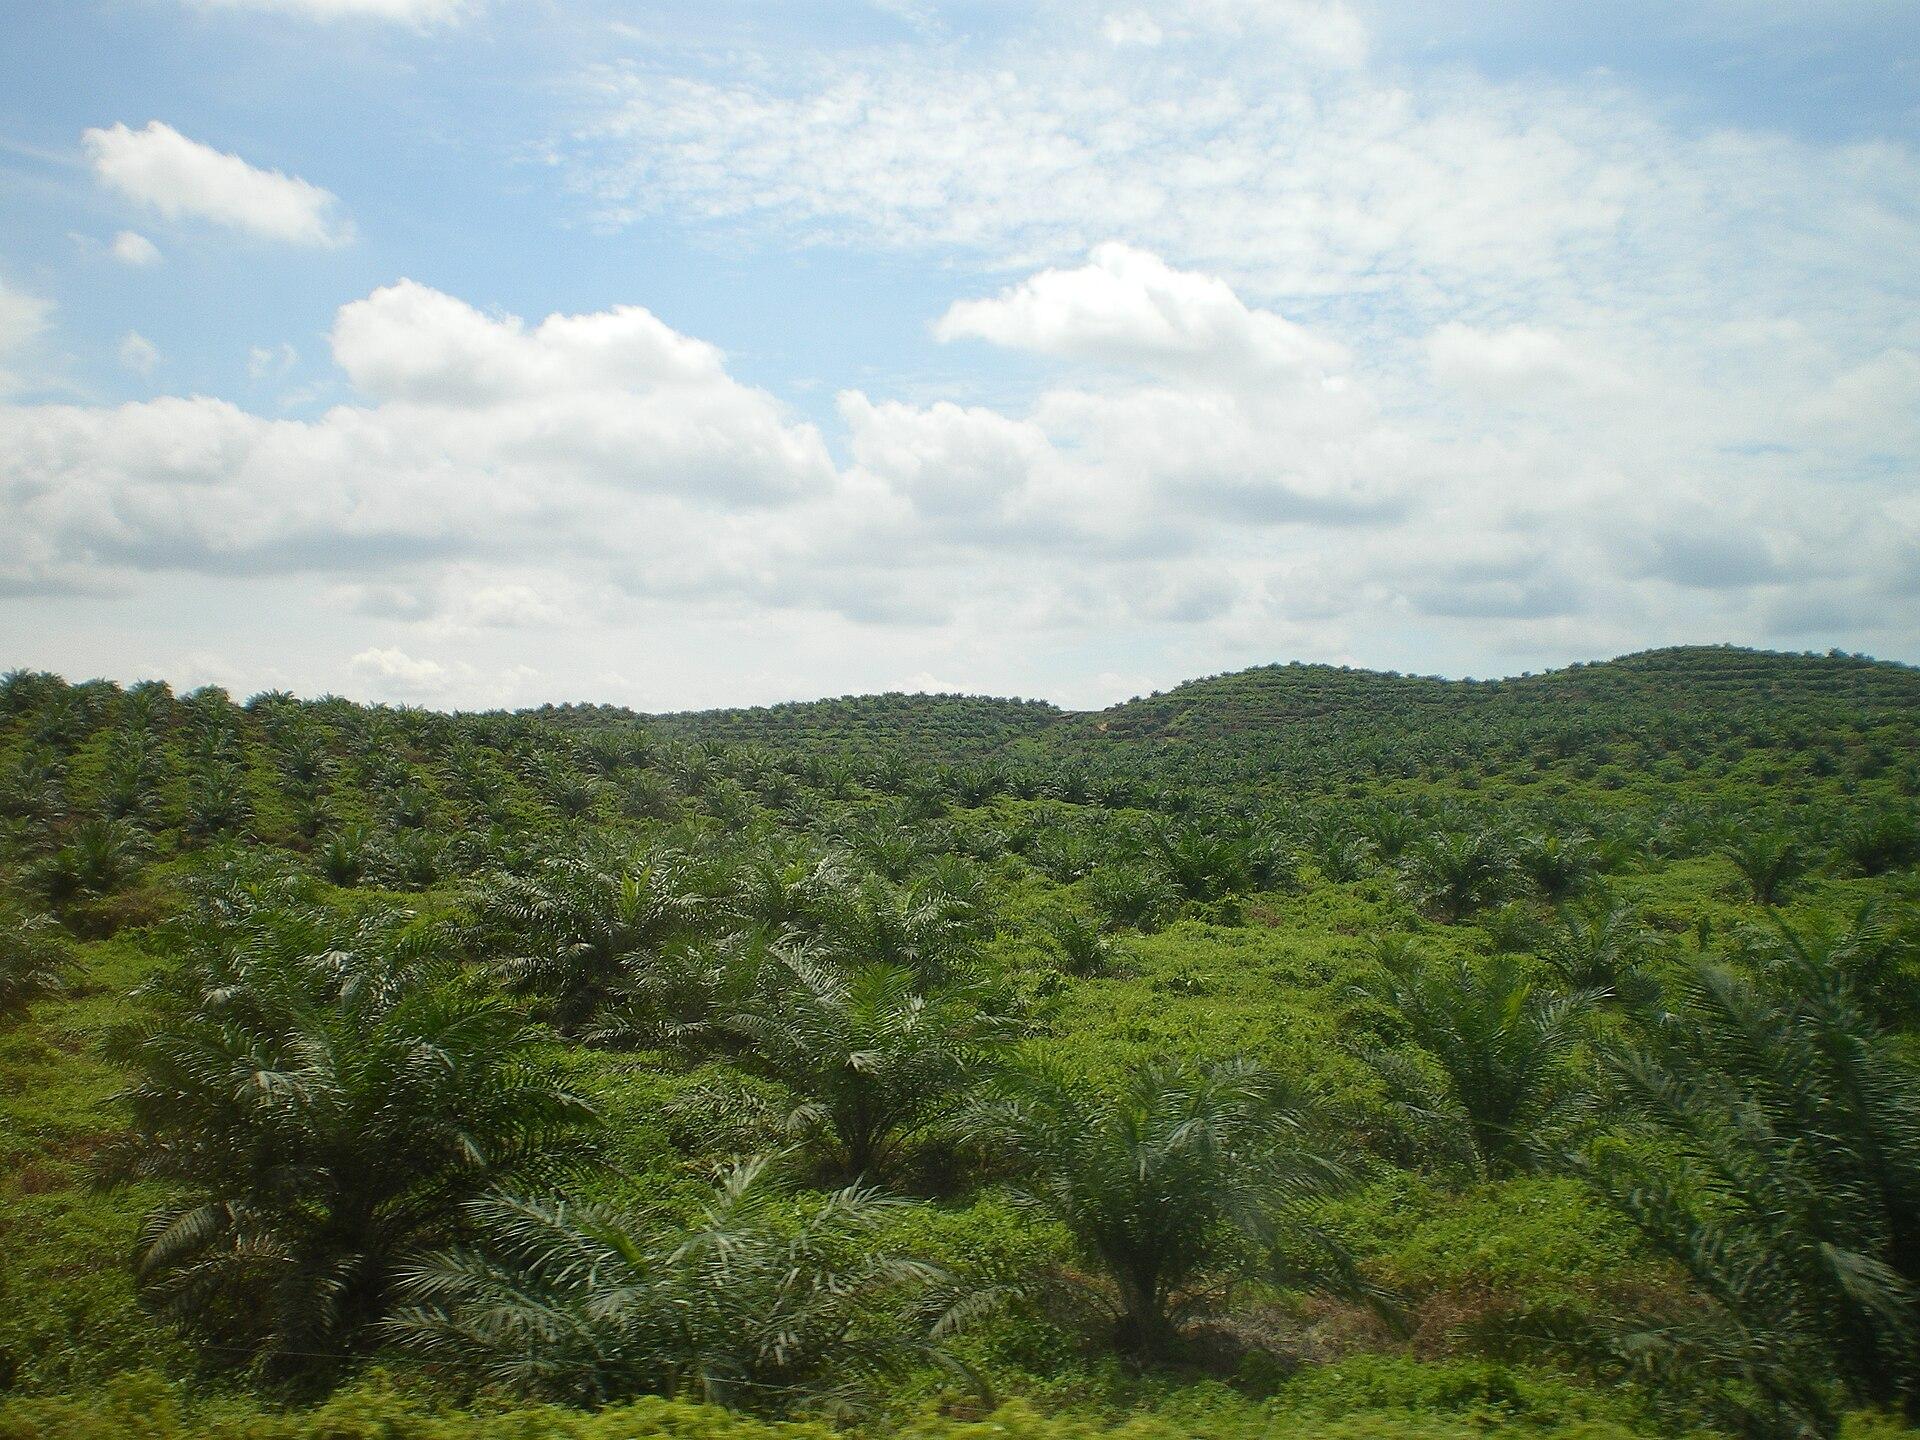 Junge Palmöl-Plantage in Ost-Malaysia